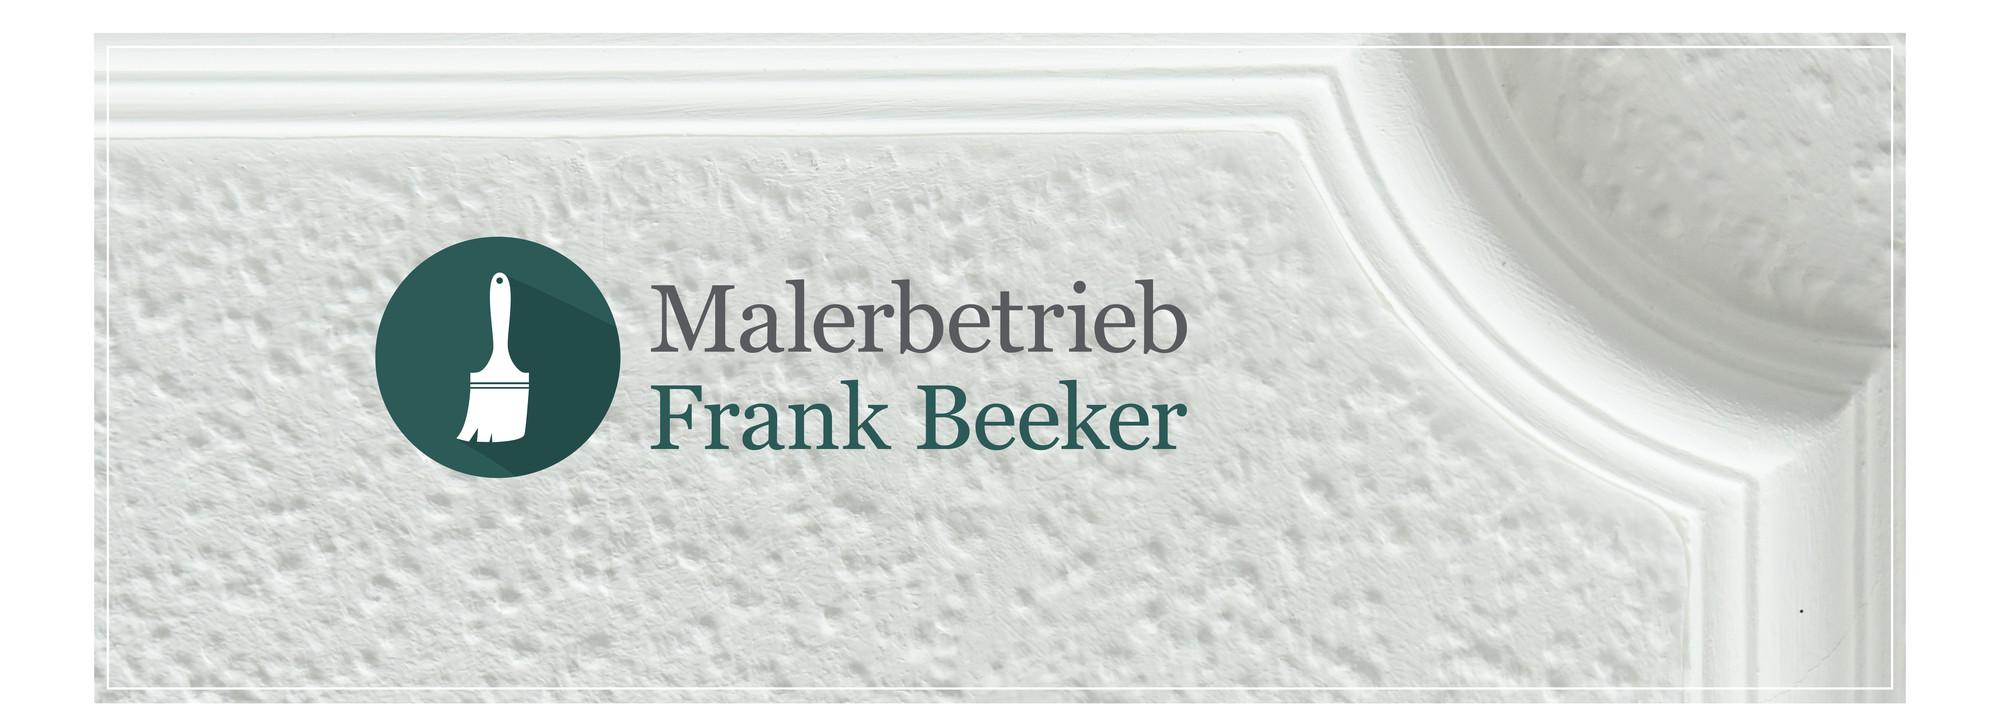 Malerbetrieb Frank Beeker